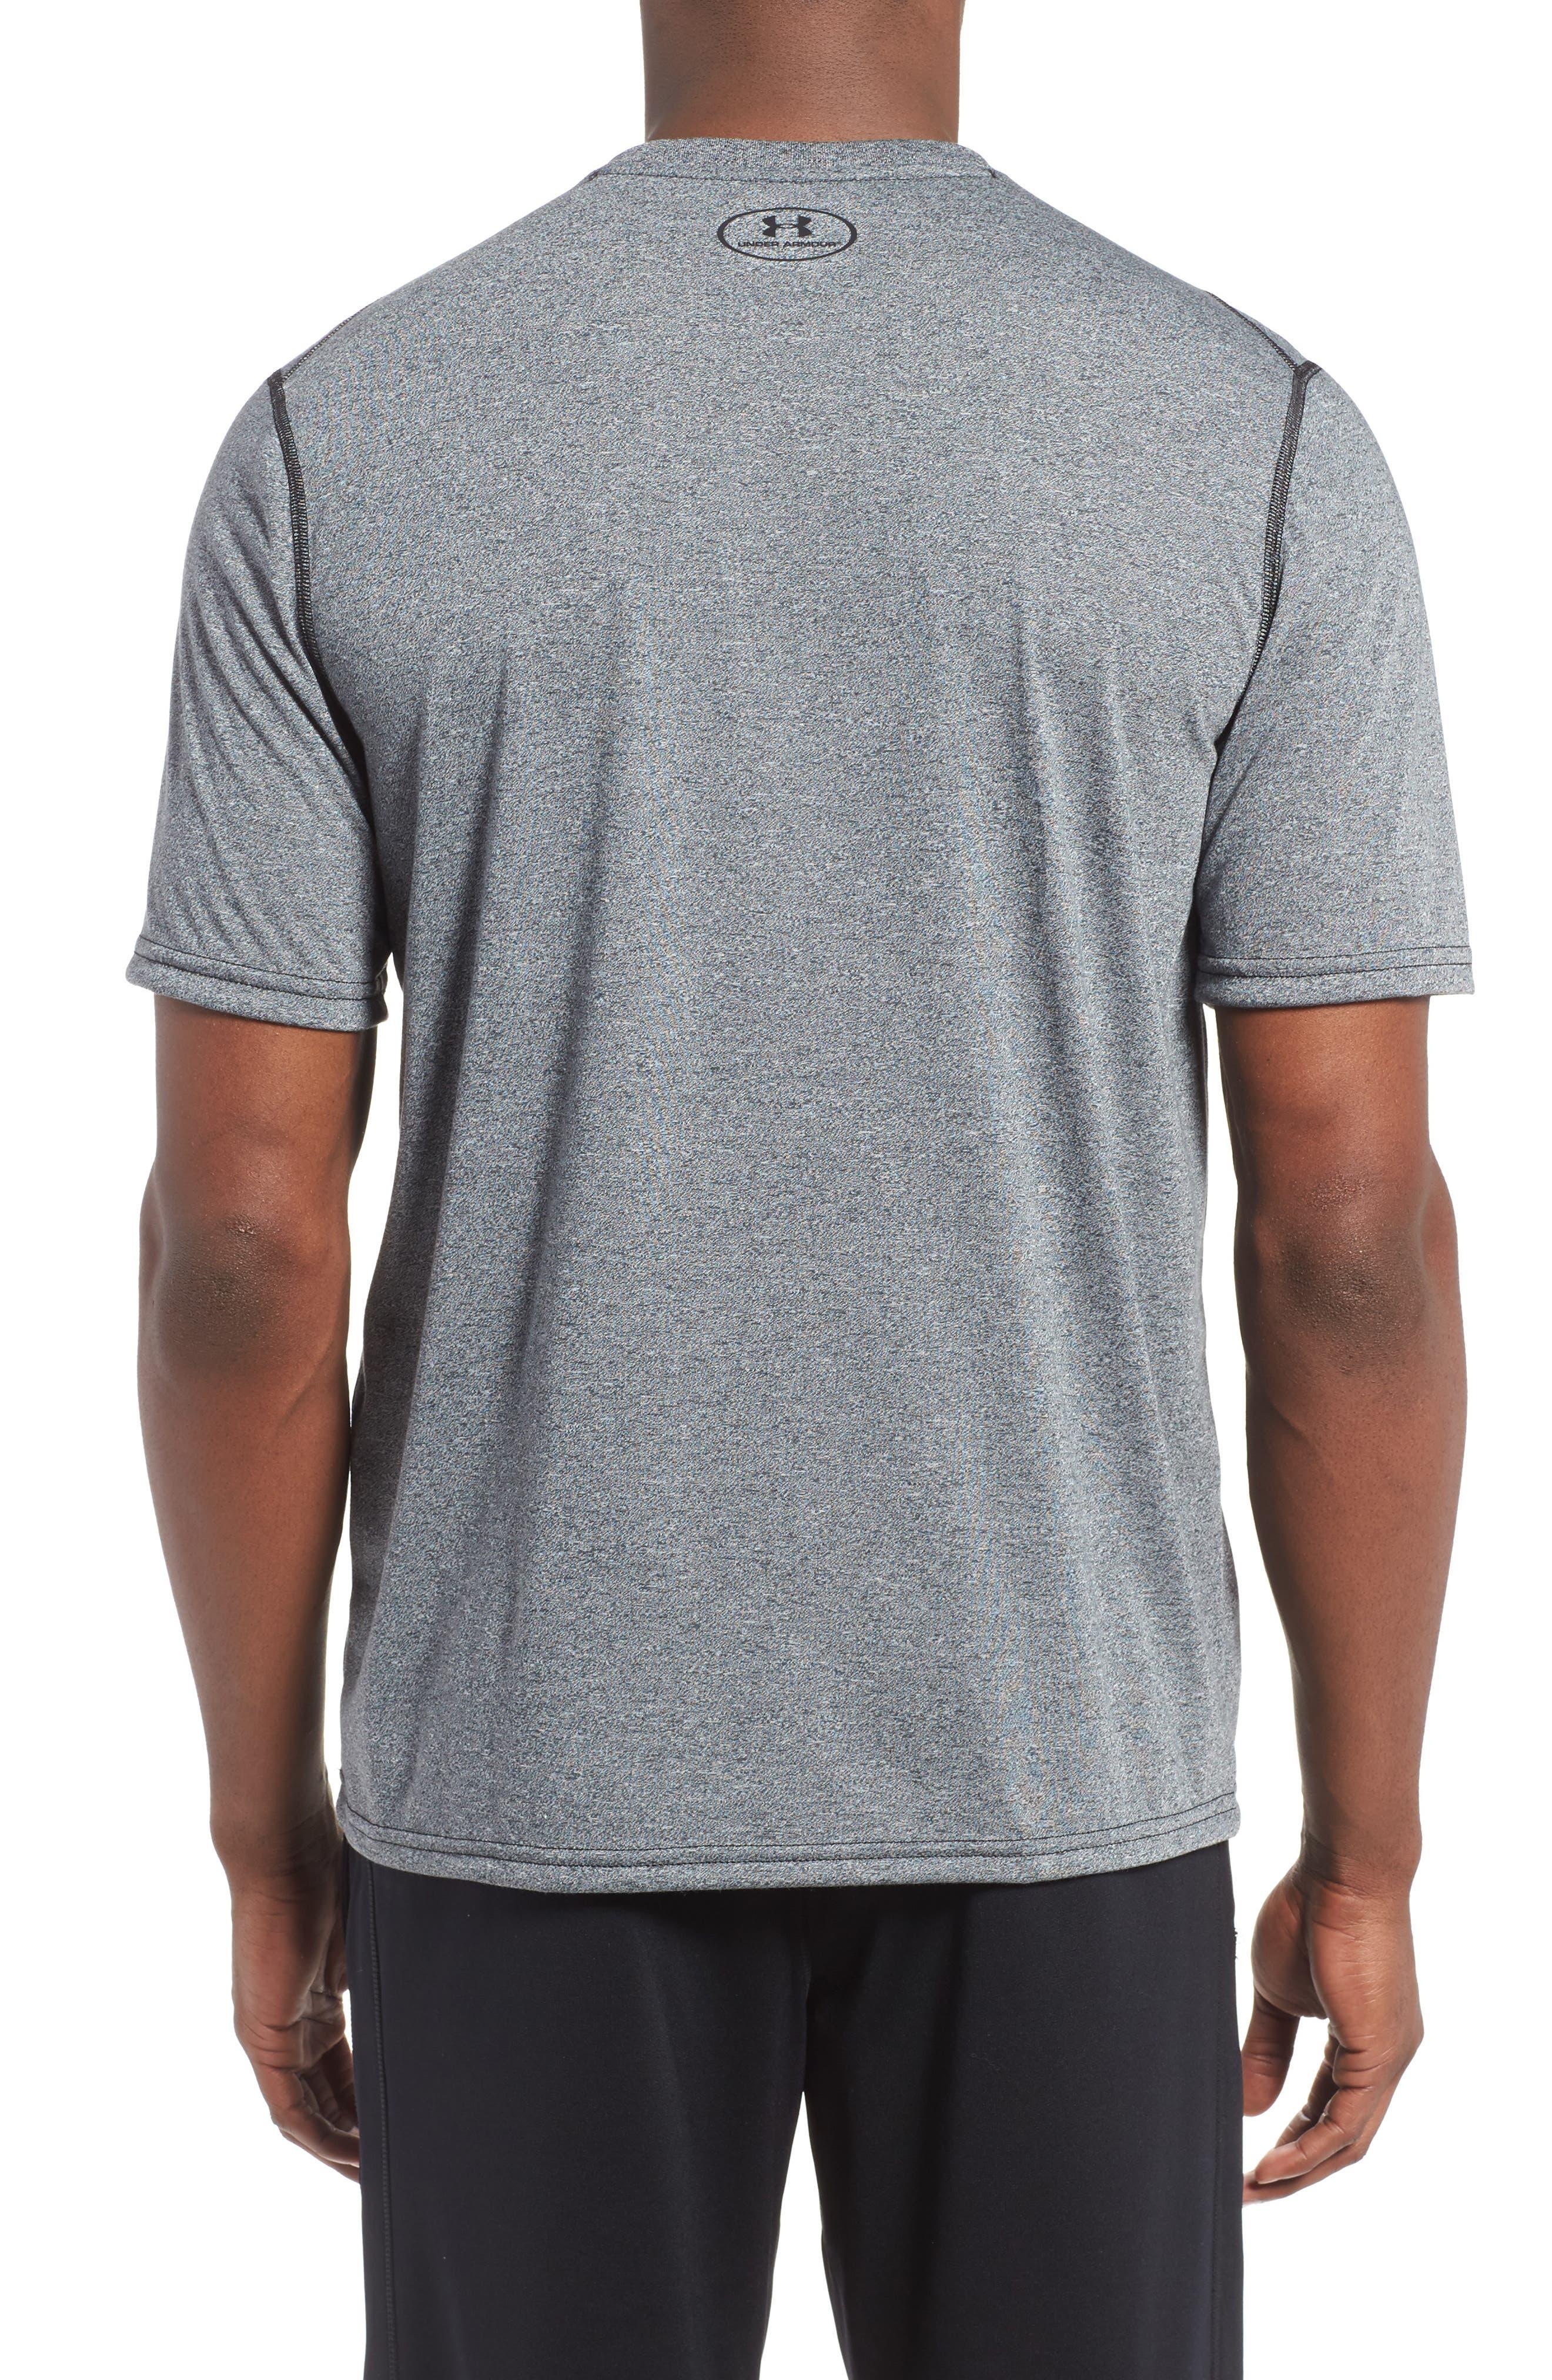 Regular Fit Threadborne T-Shirt,                             Alternate thumbnail 2, color,                             021